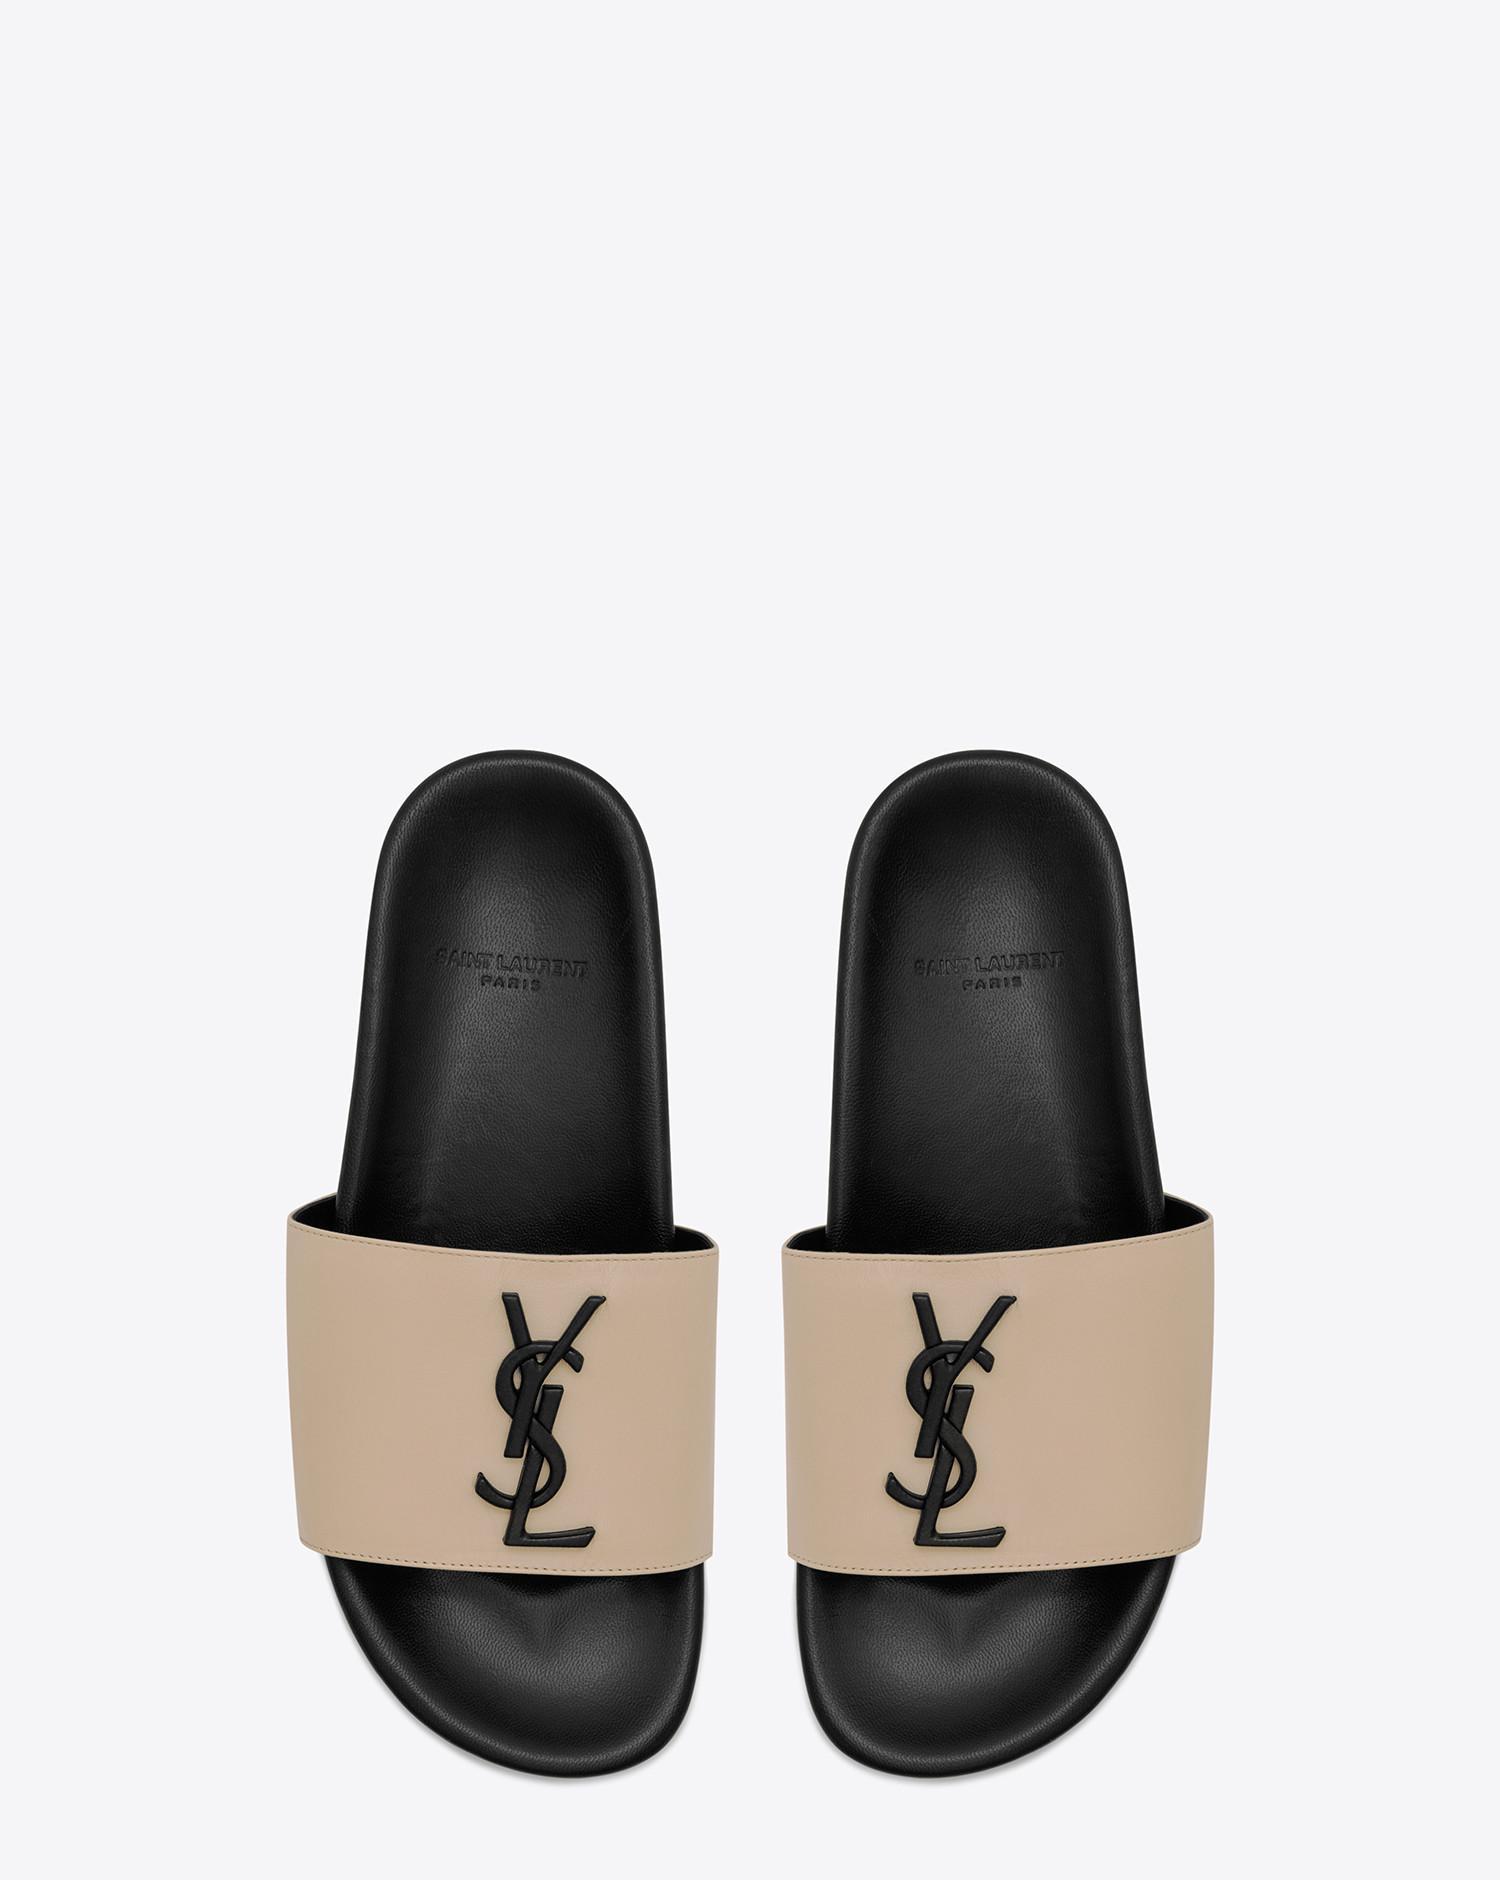 ab71b80e385 Lyst - Saint Laurent Joan 05 Slide Sandal In Powder And Black Leather